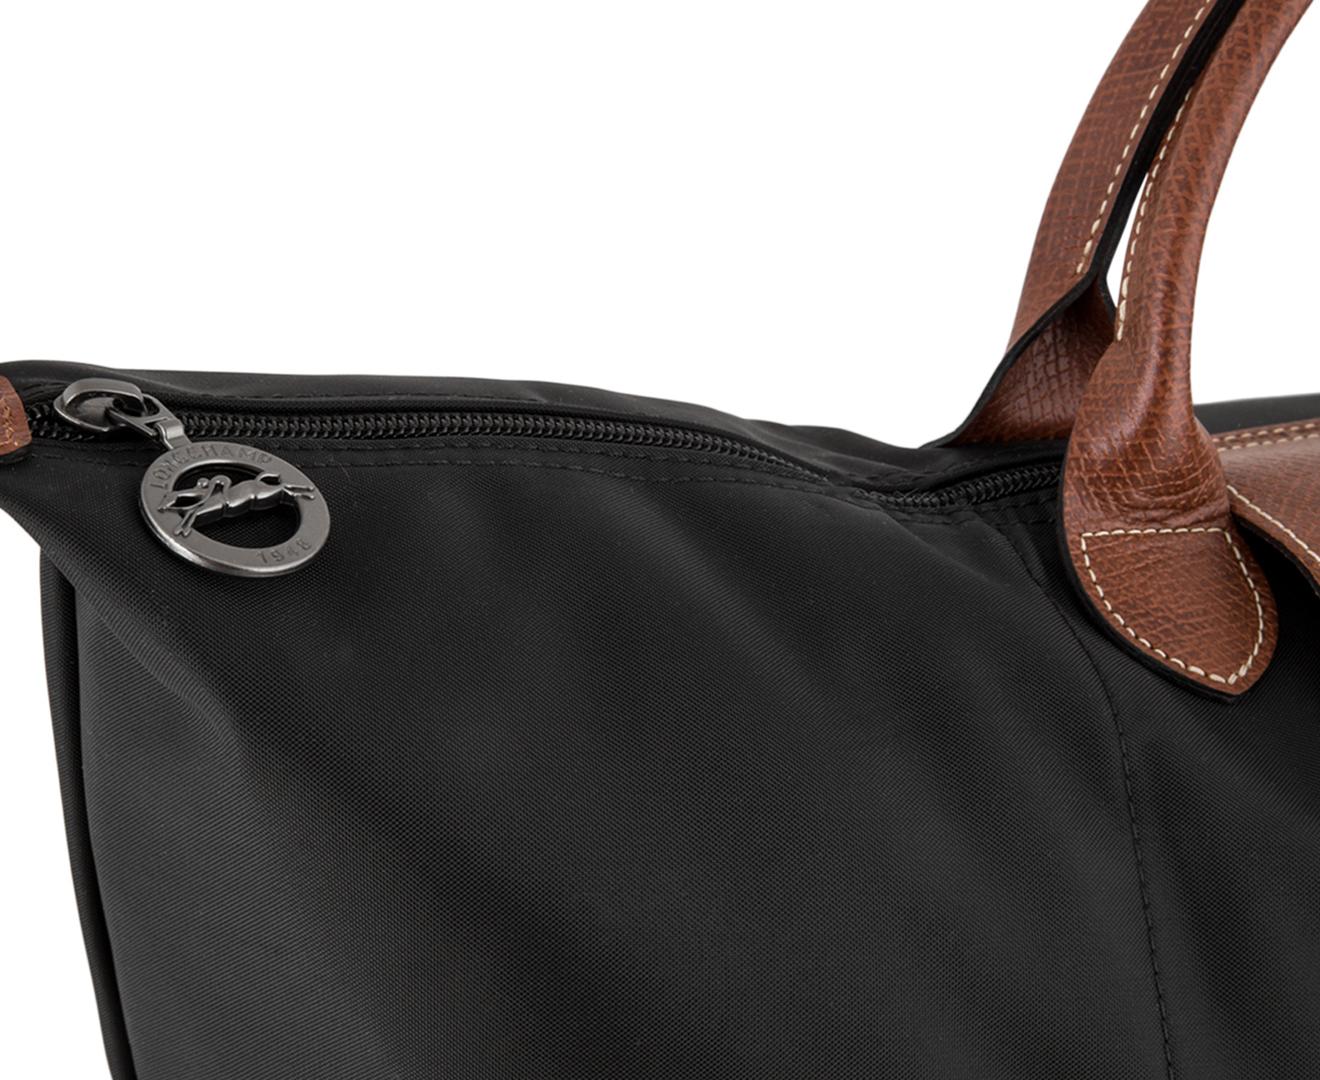 Longchamp Le Pliage Expandable Travel Bag Uk   ReGreen Springfield 830f110f23